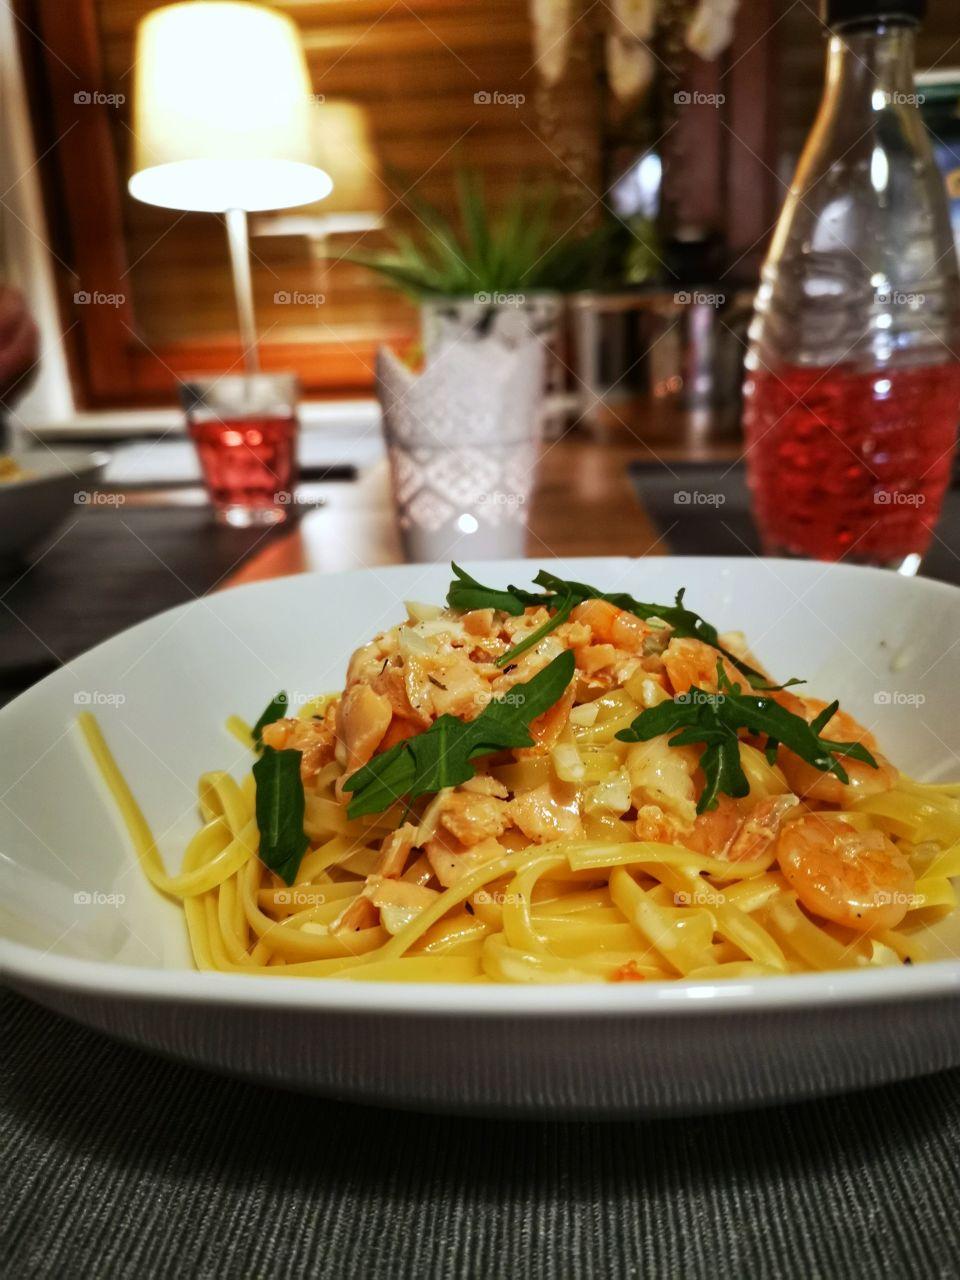 Pasta and Fish| Dinner